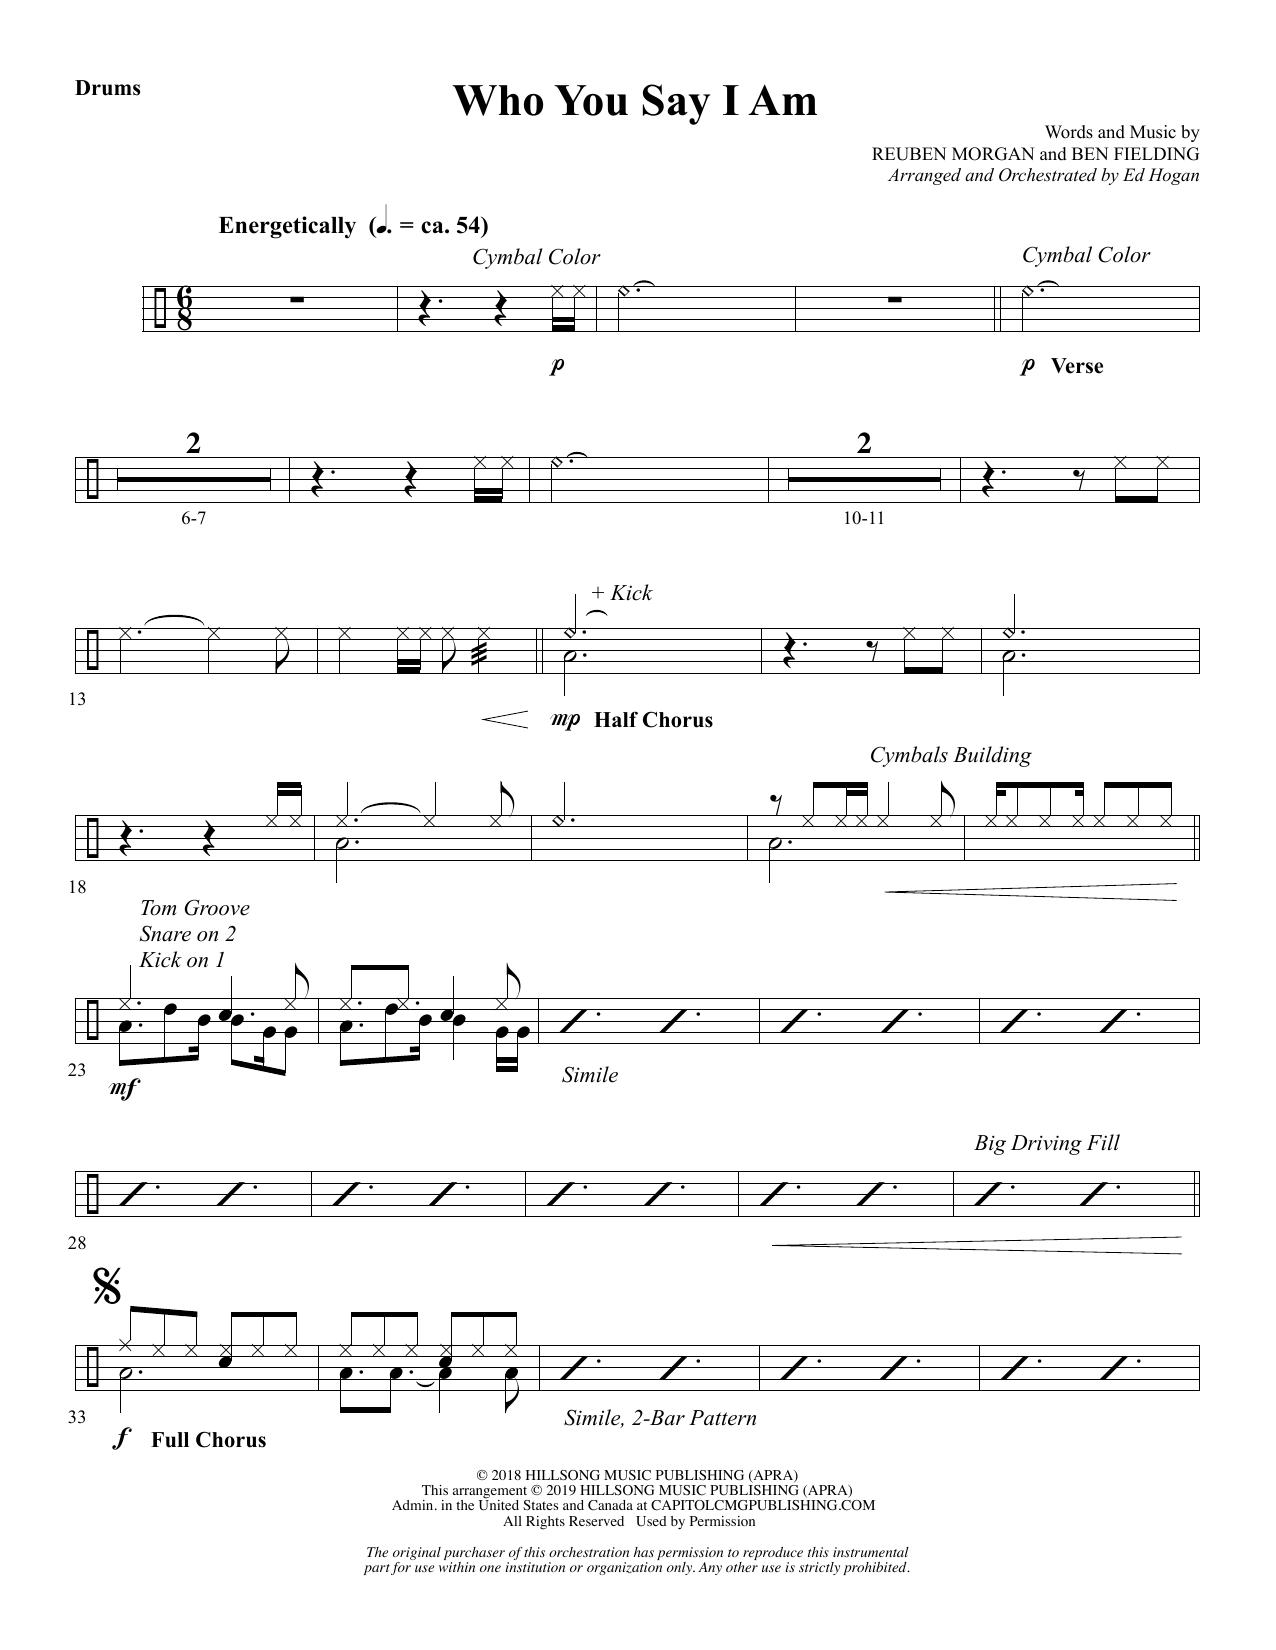 Who You Say I Am (arr. Ed Hogan) - Drums Sheet Music